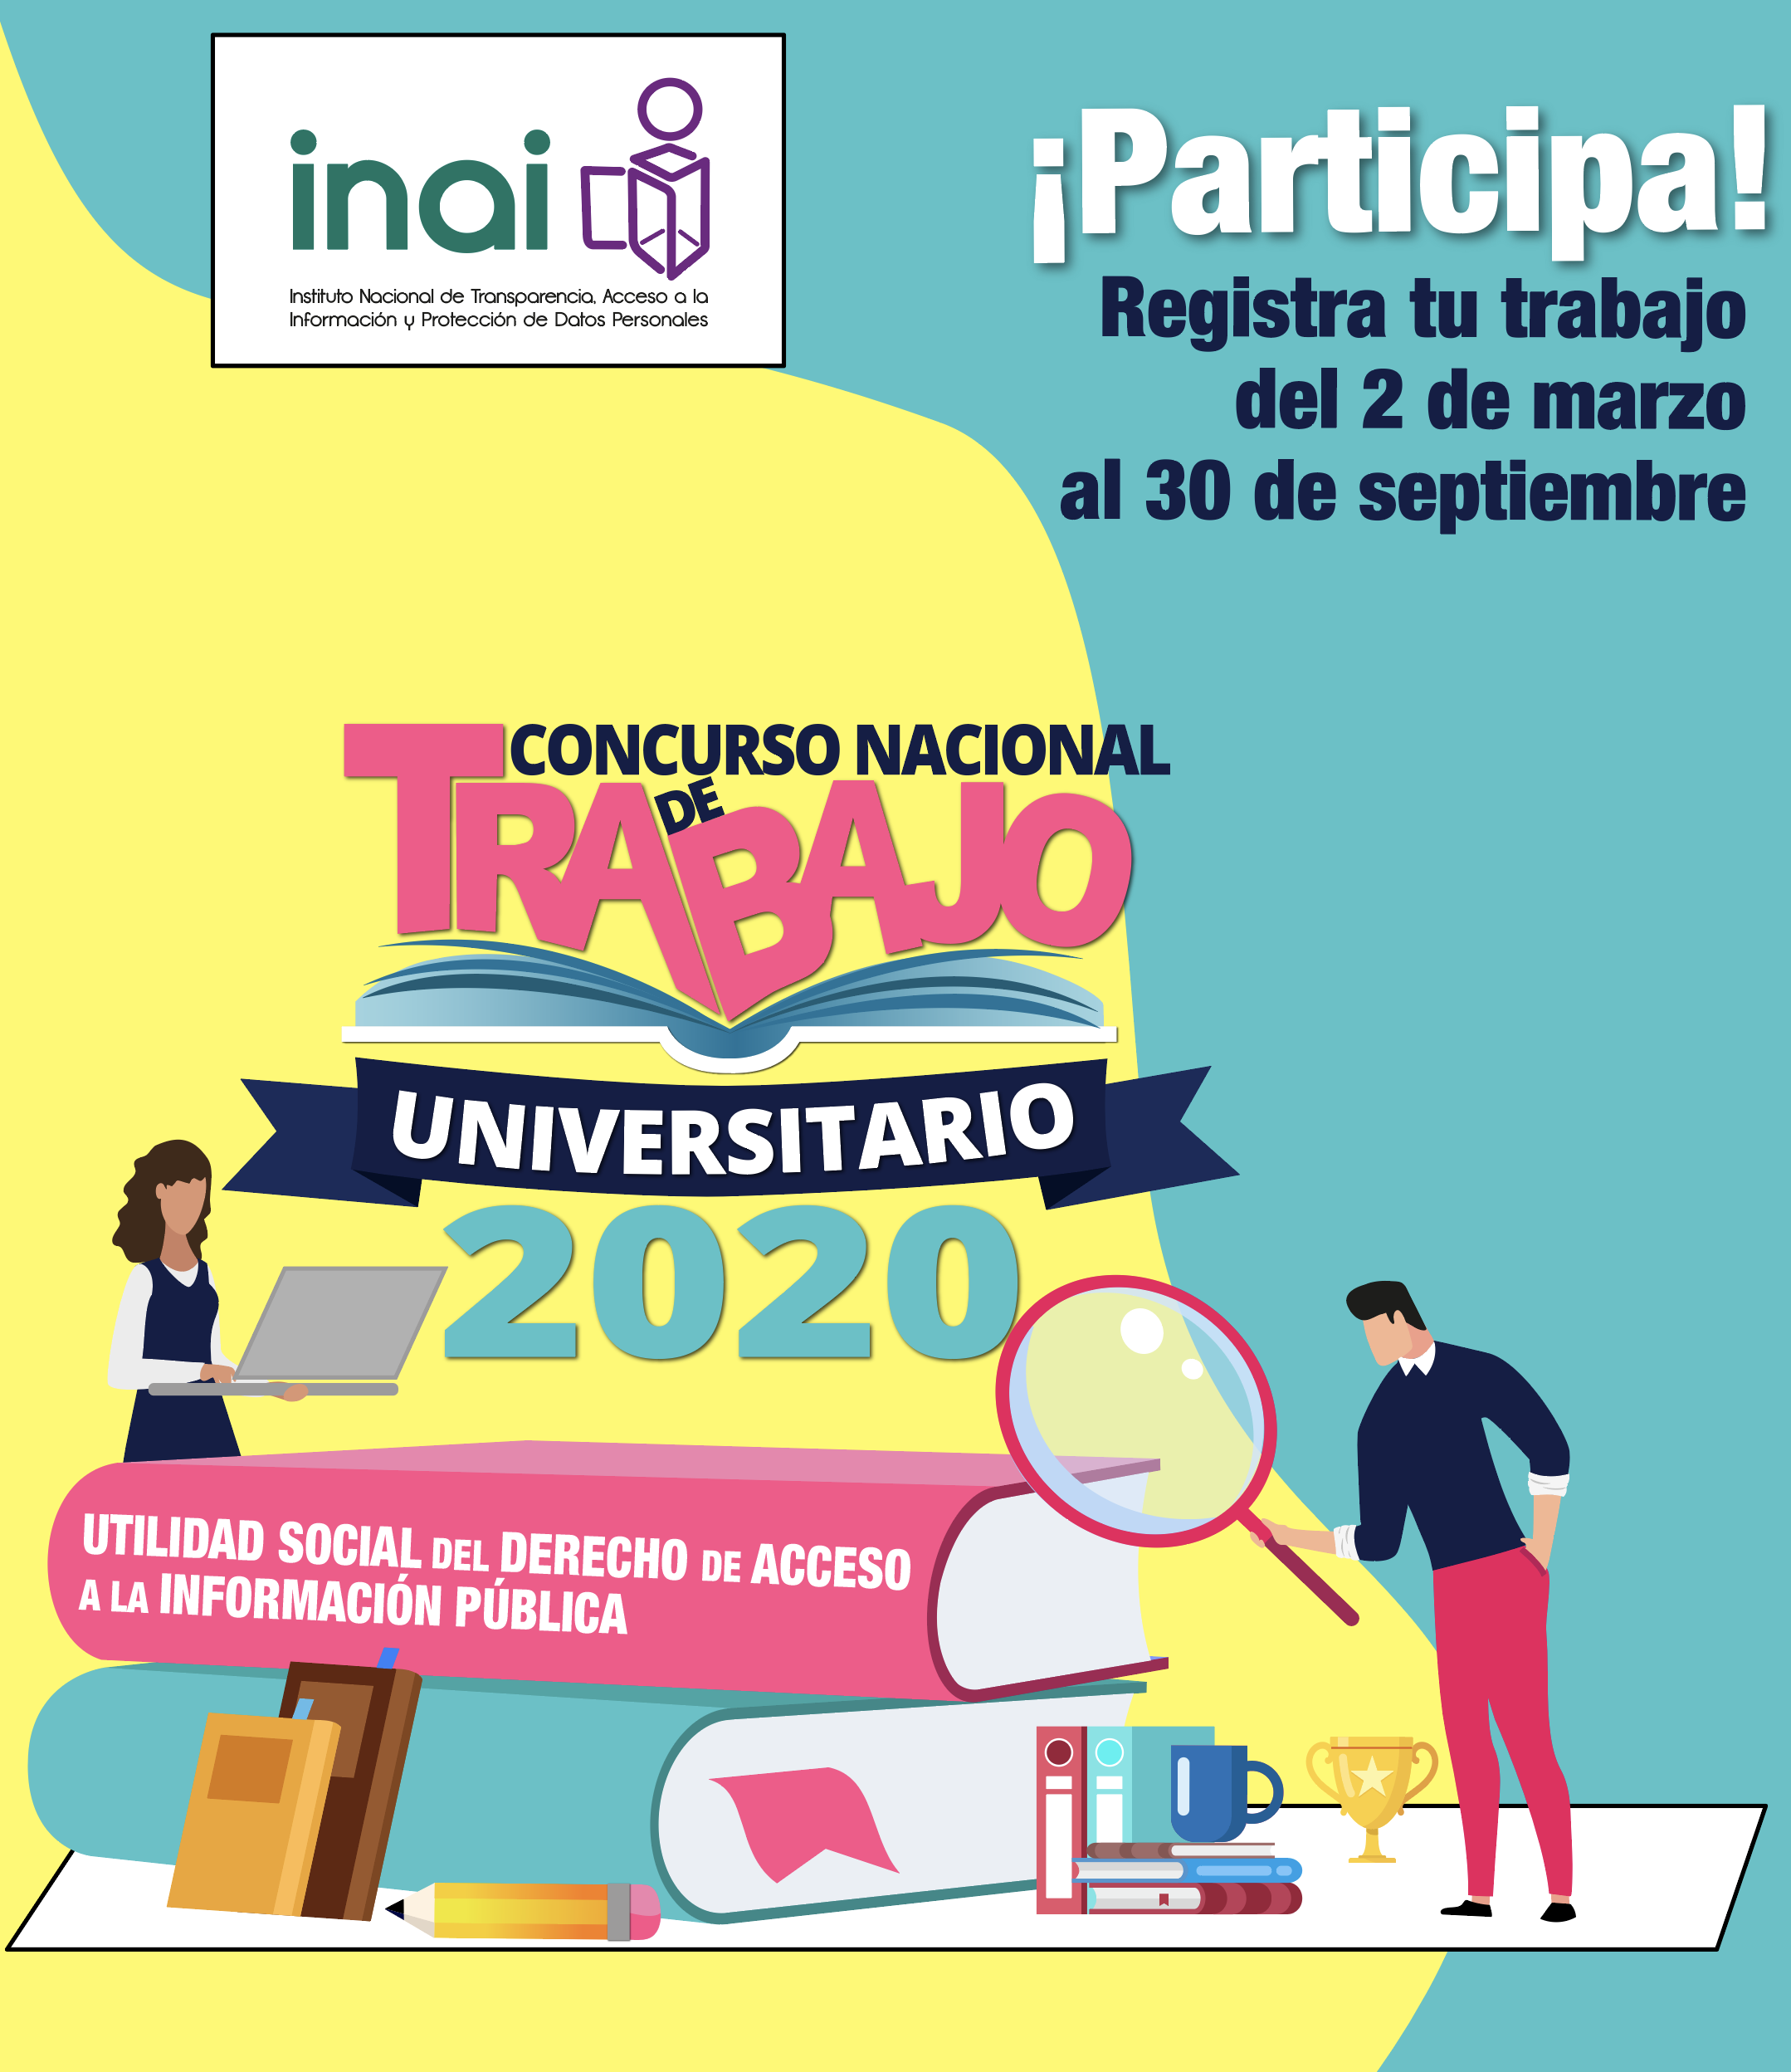 INAI :: Concurso Nacional de Trabajo Universitario 2020